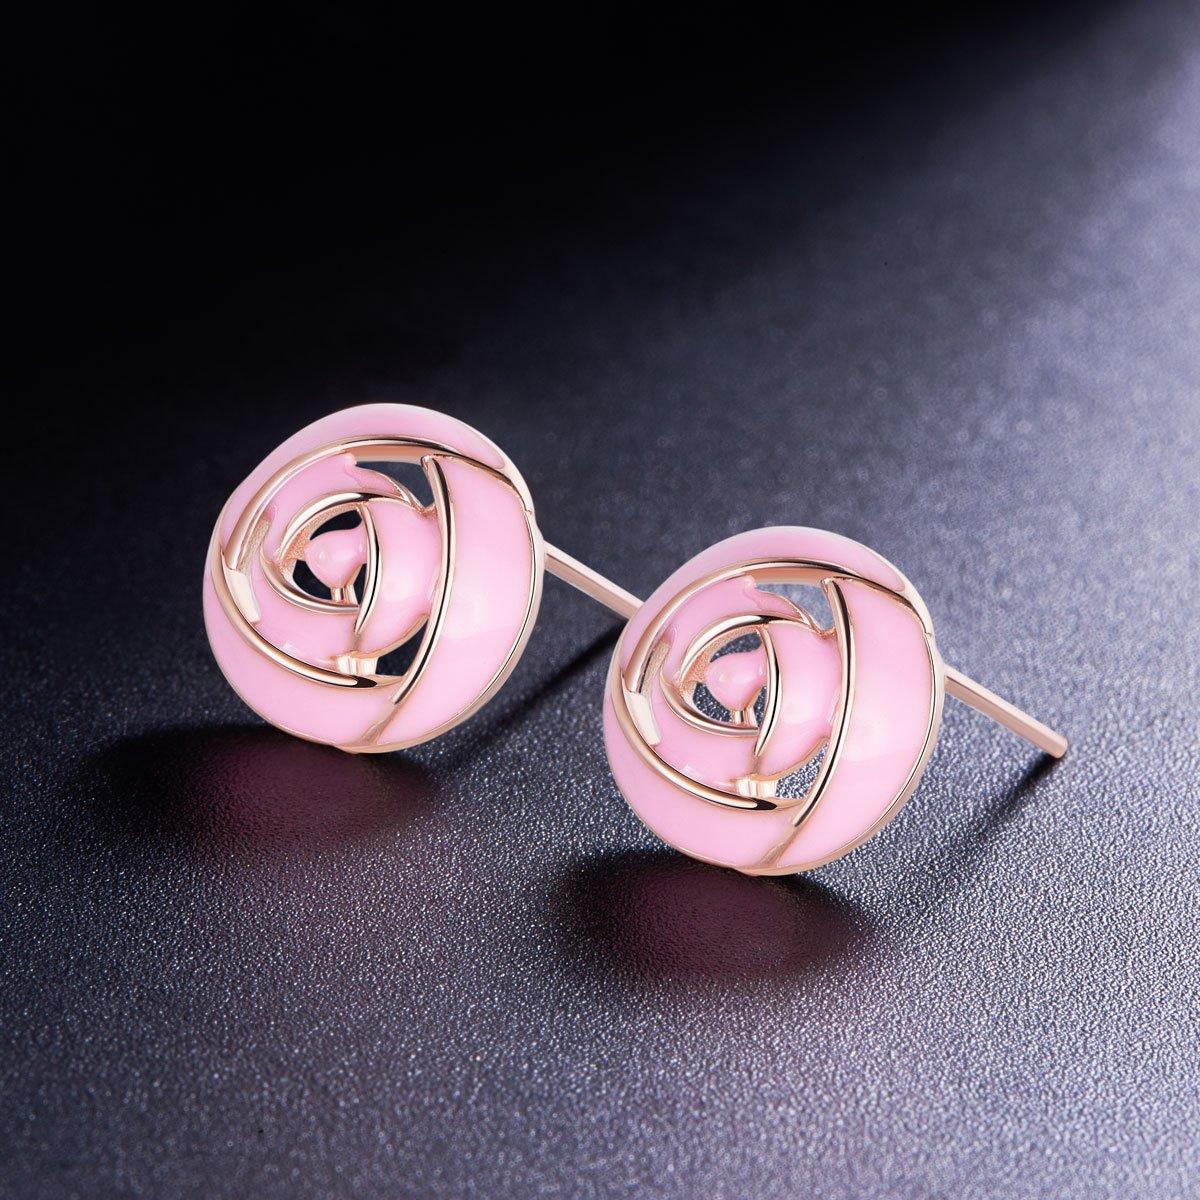 SHEGRACE 925 Sterling Silver Ear Studs with Pink Enamel Rose Flower Rose Gold 10mm